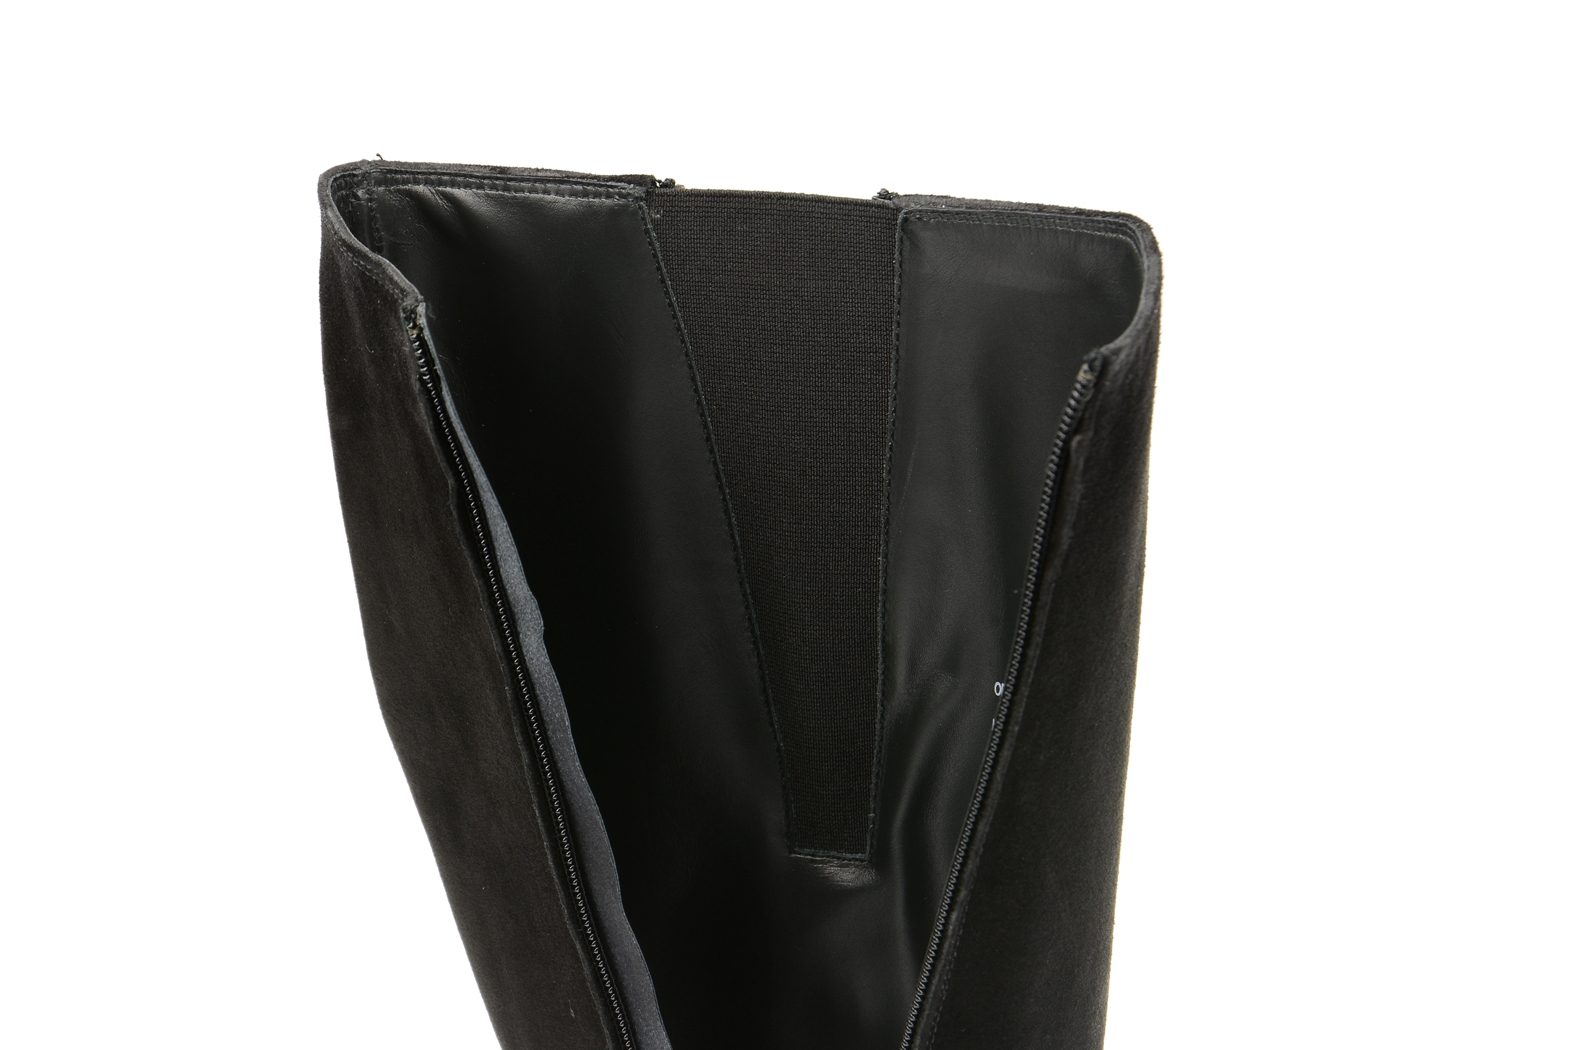 paul green stiefel schwarz gr 37 8551 024 schuhhaus. Black Bedroom Furniture Sets. Home Design Ideas